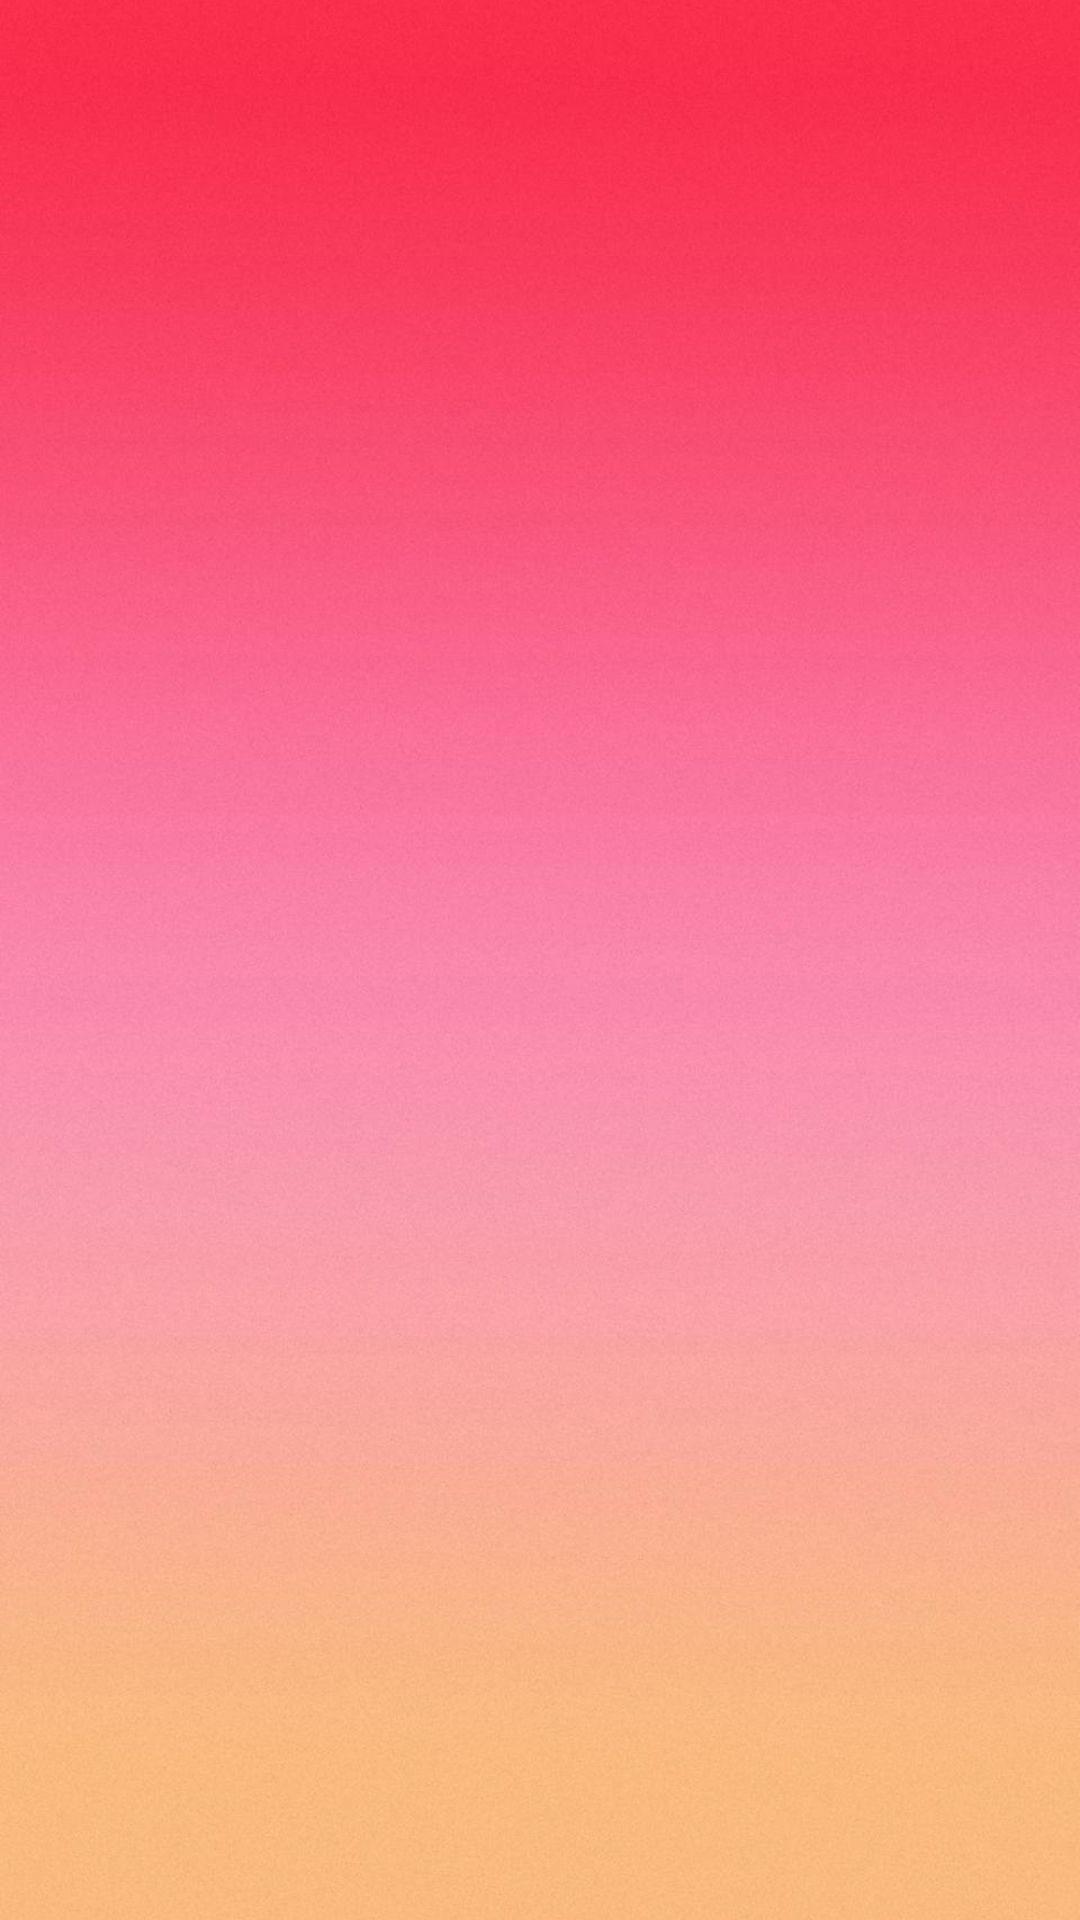 Ombre iPhone 5 wallpaper